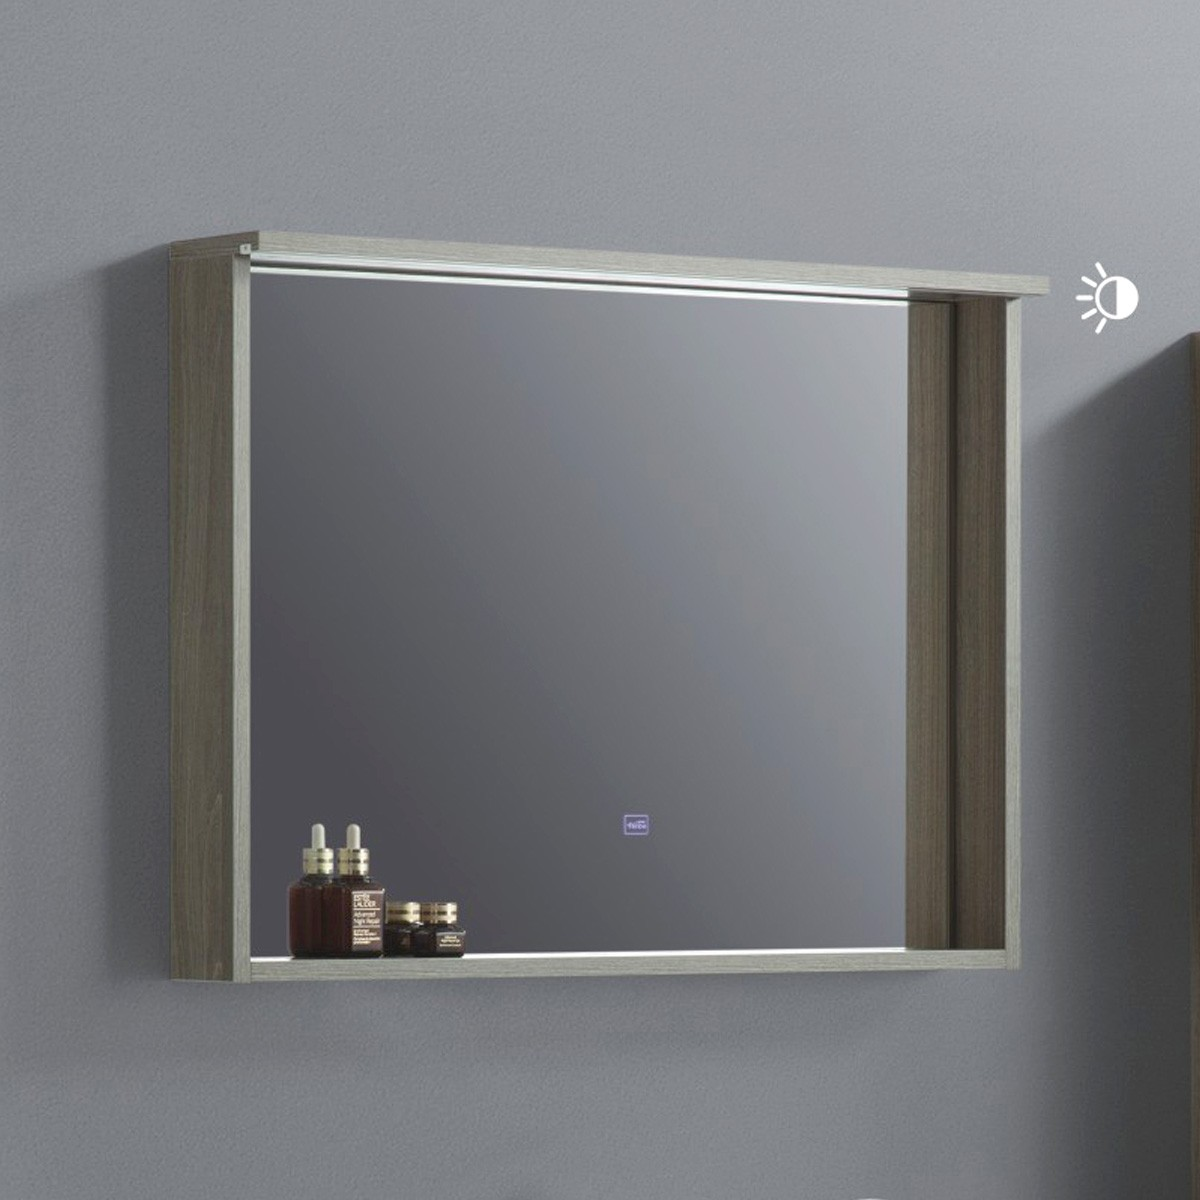 32 x 24 In. LED Bathroom Vanity Mirror with Shelf (VSW8002-M)